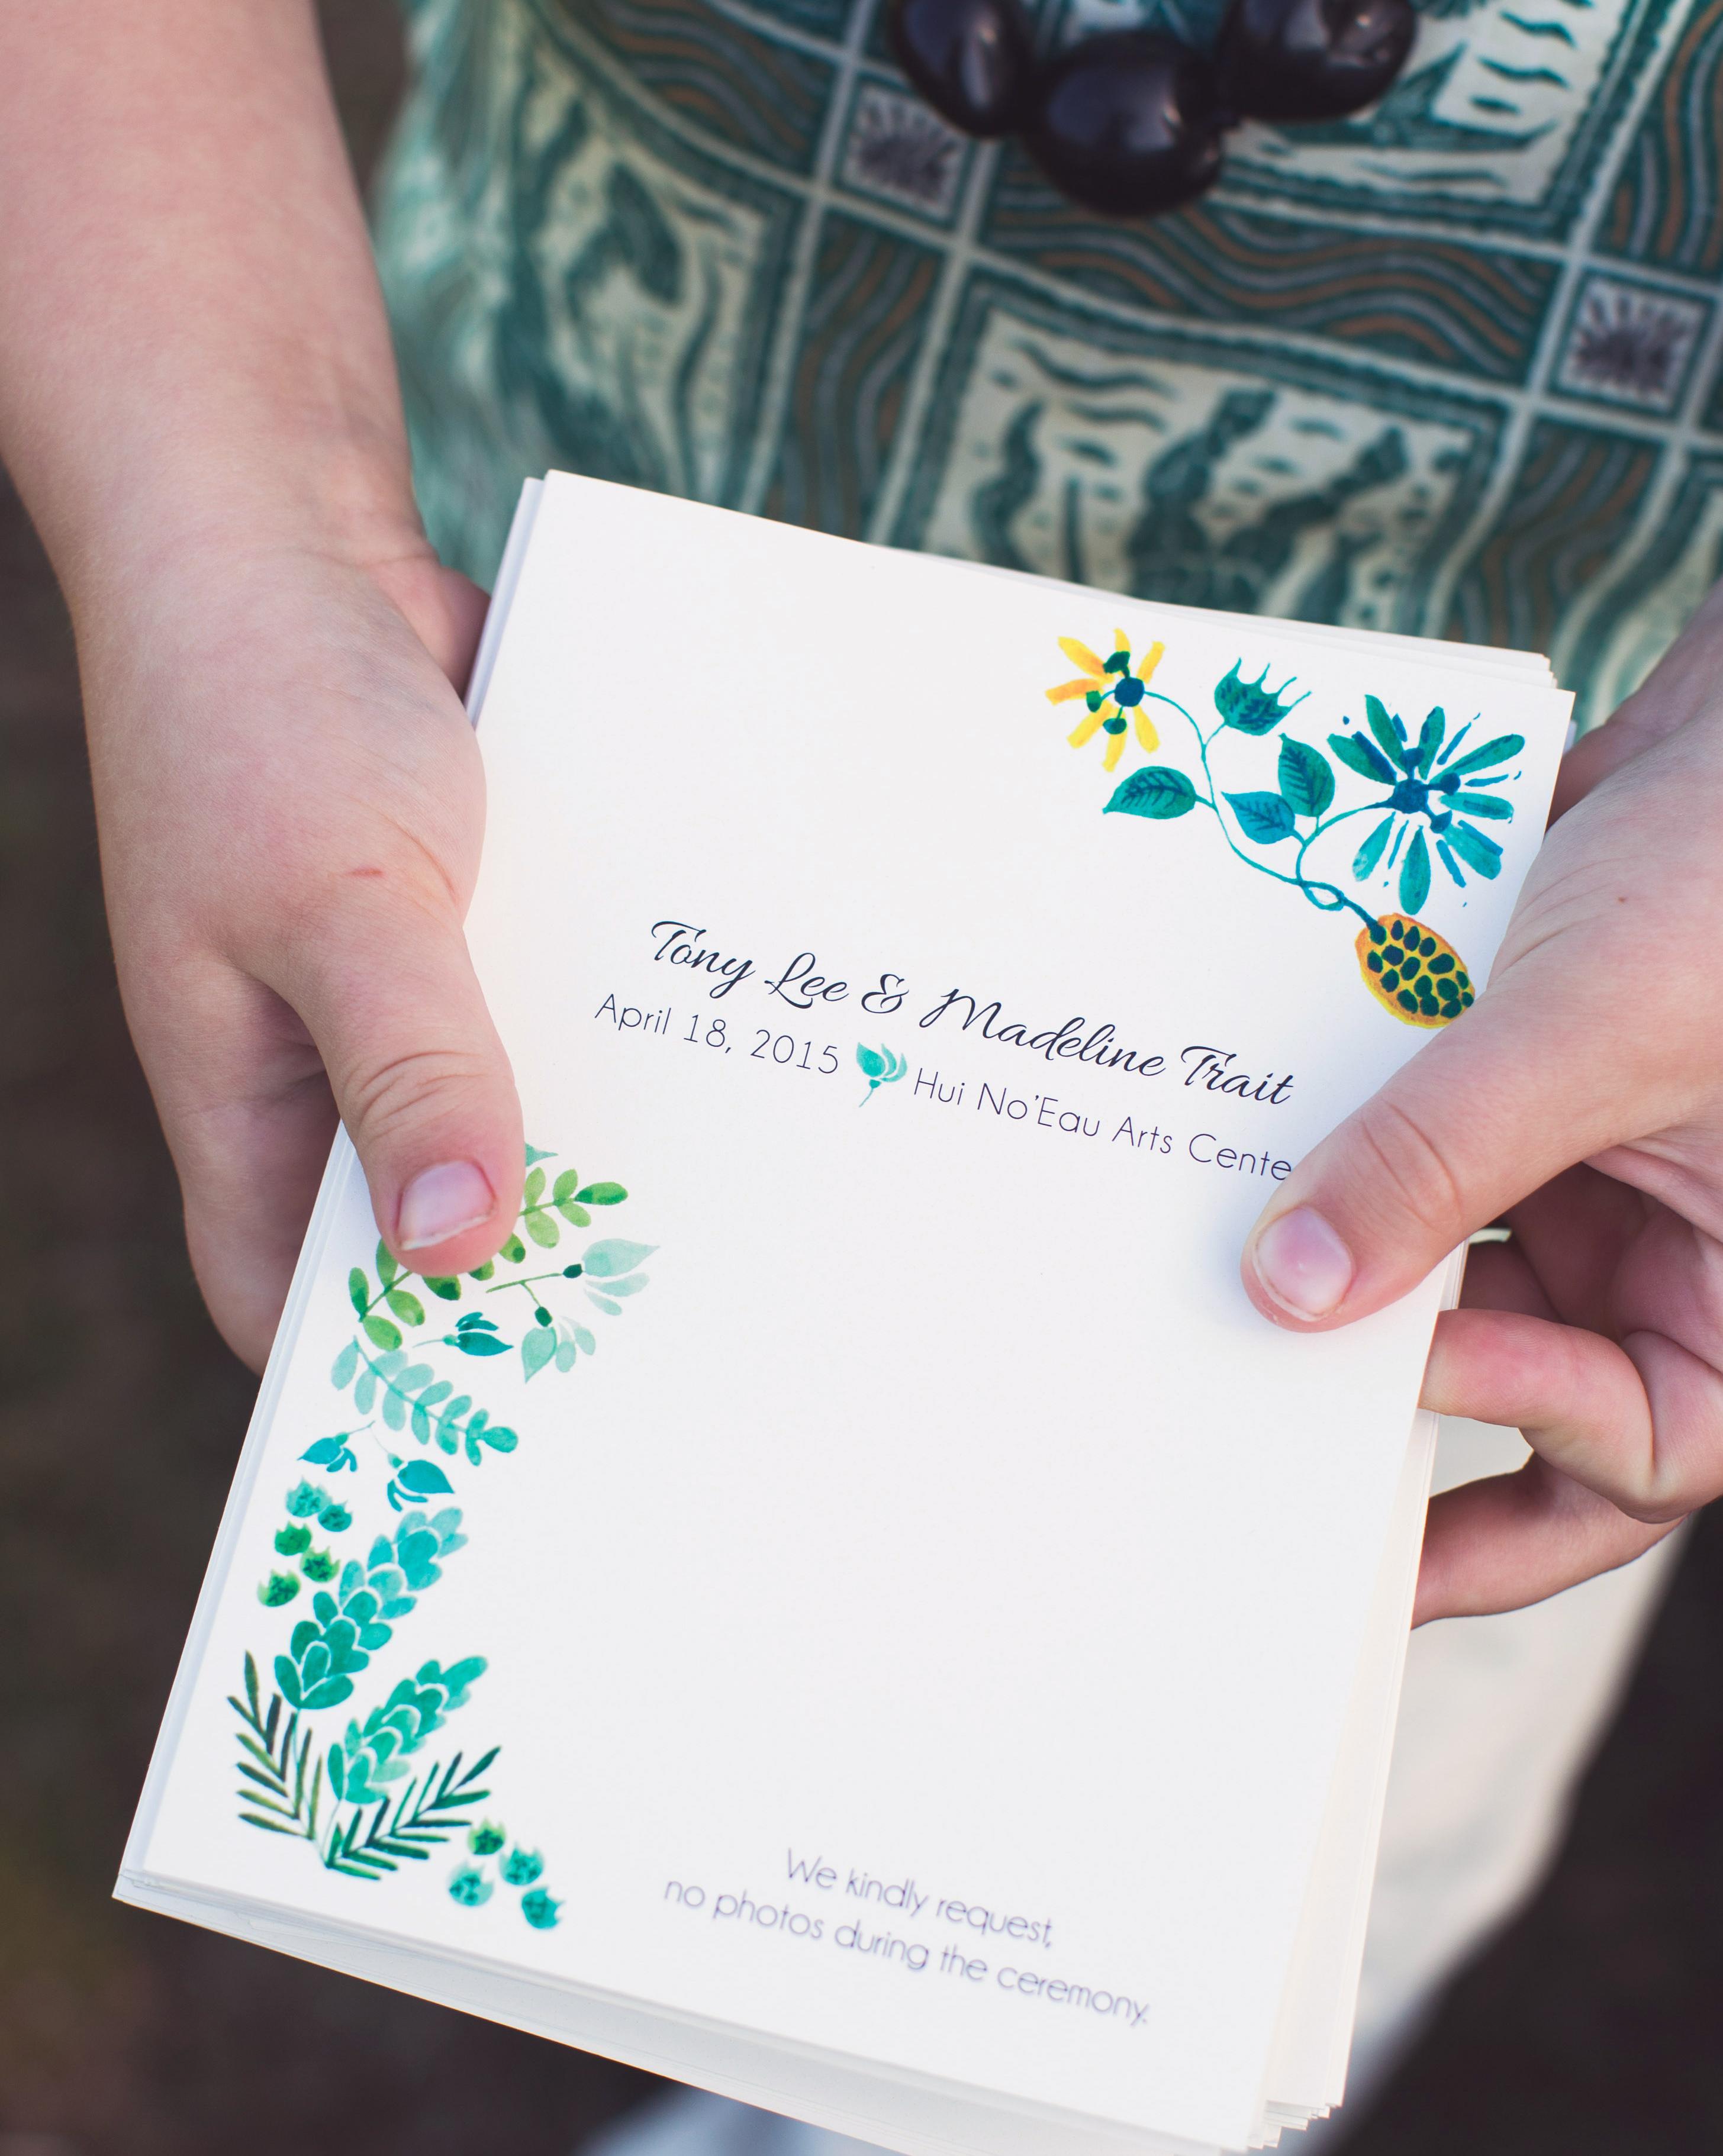 maddie-tony-wedding-programs-9309-s112424-1015.jpg